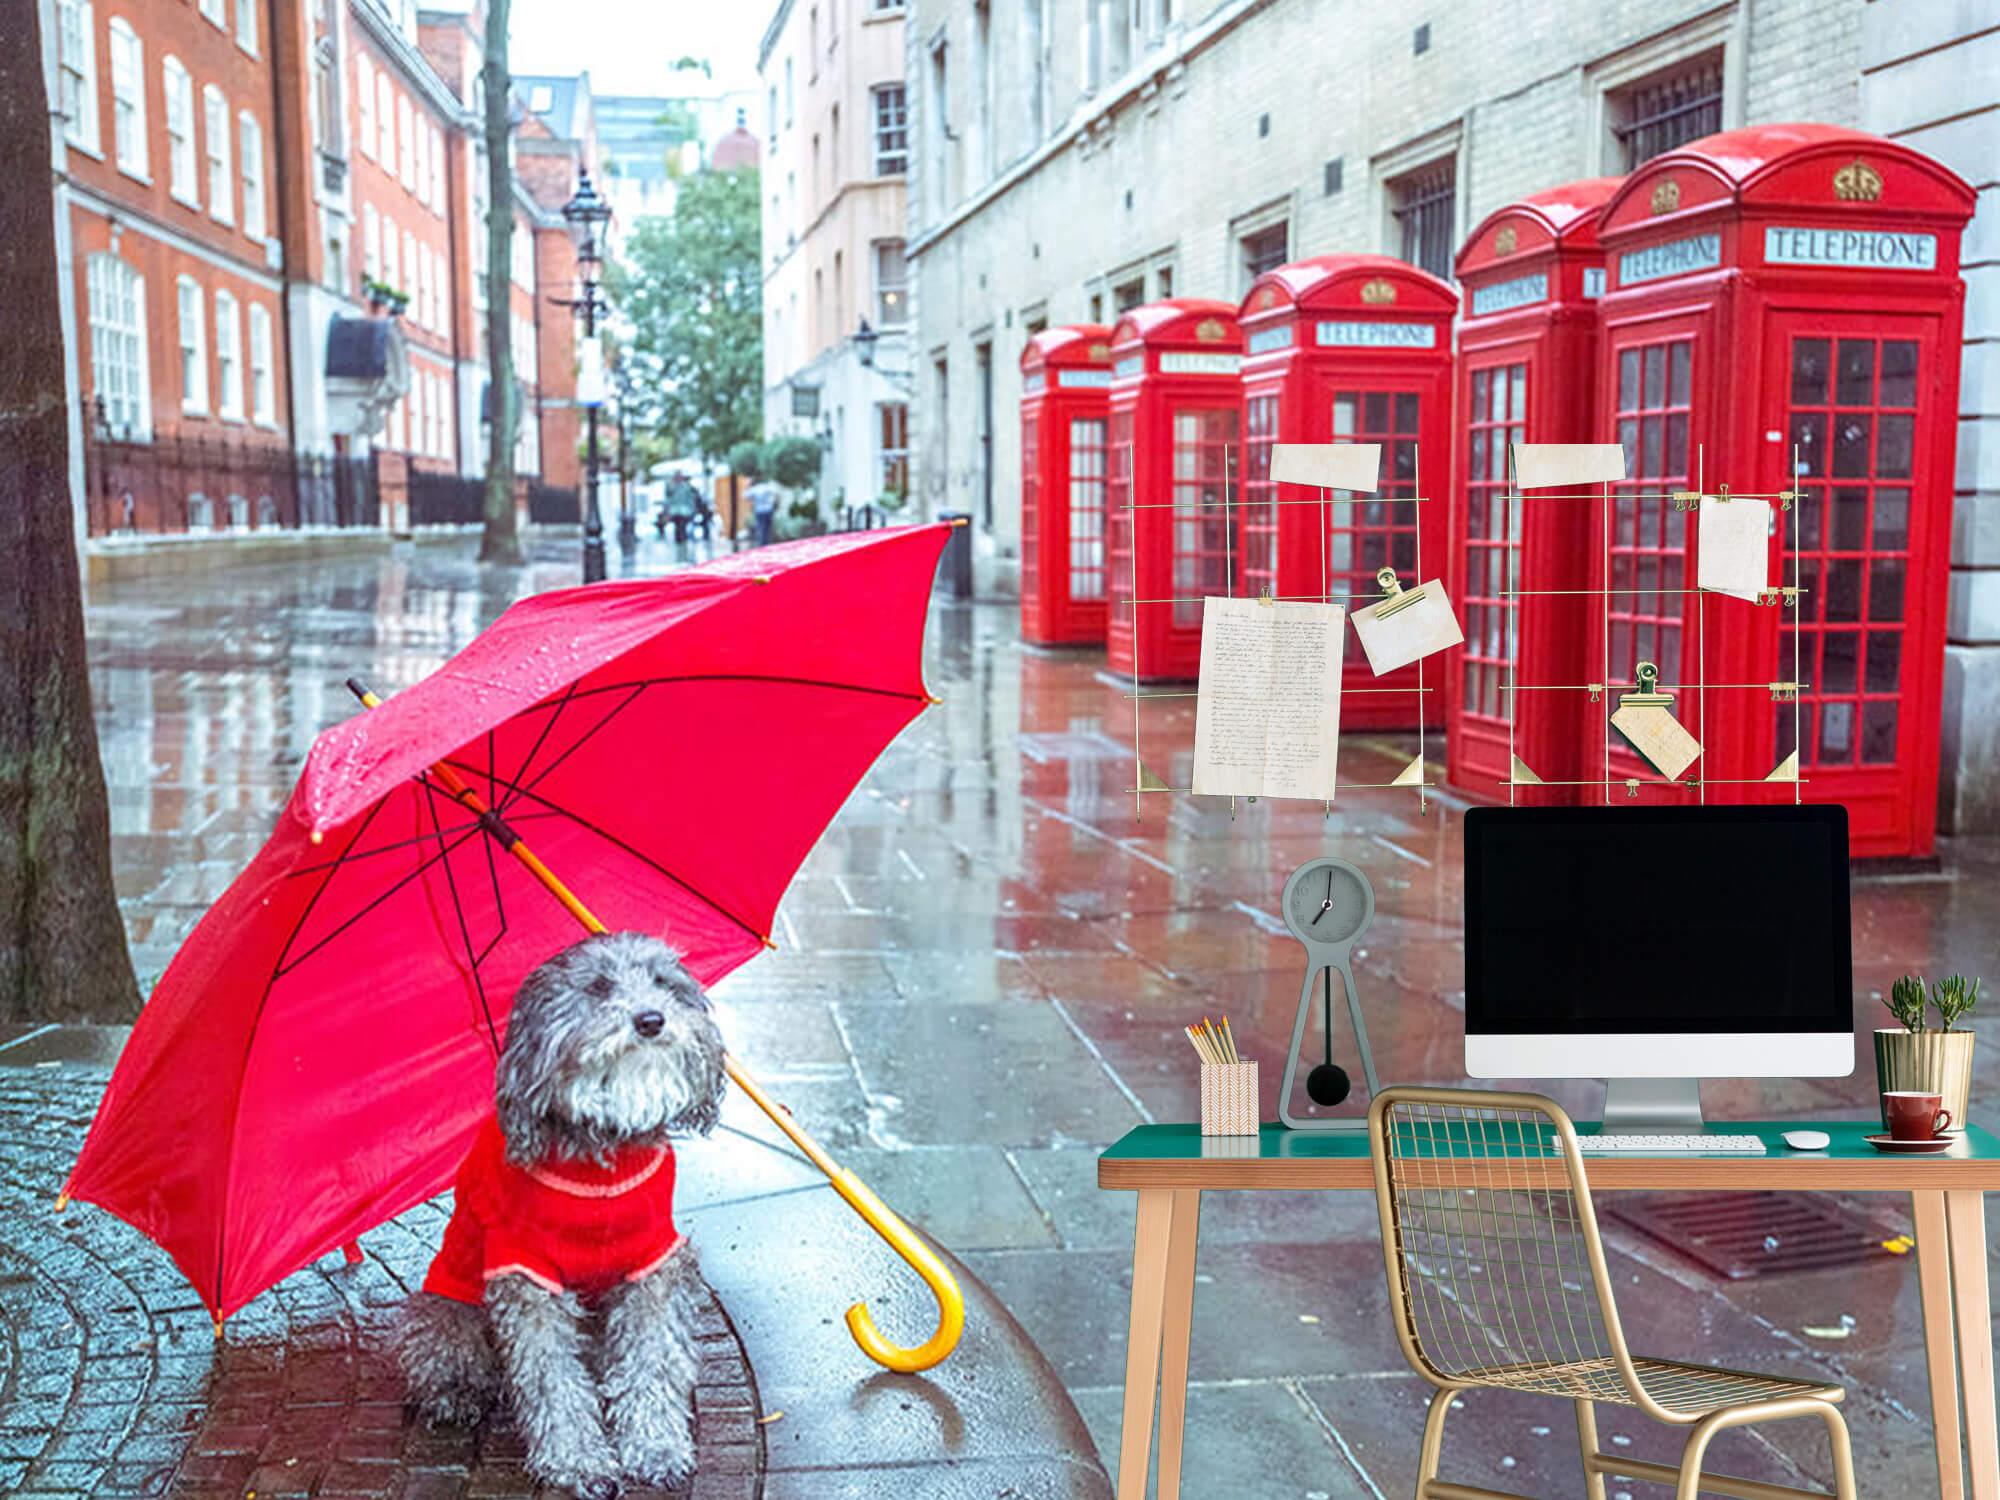 Dog with umbrella 7